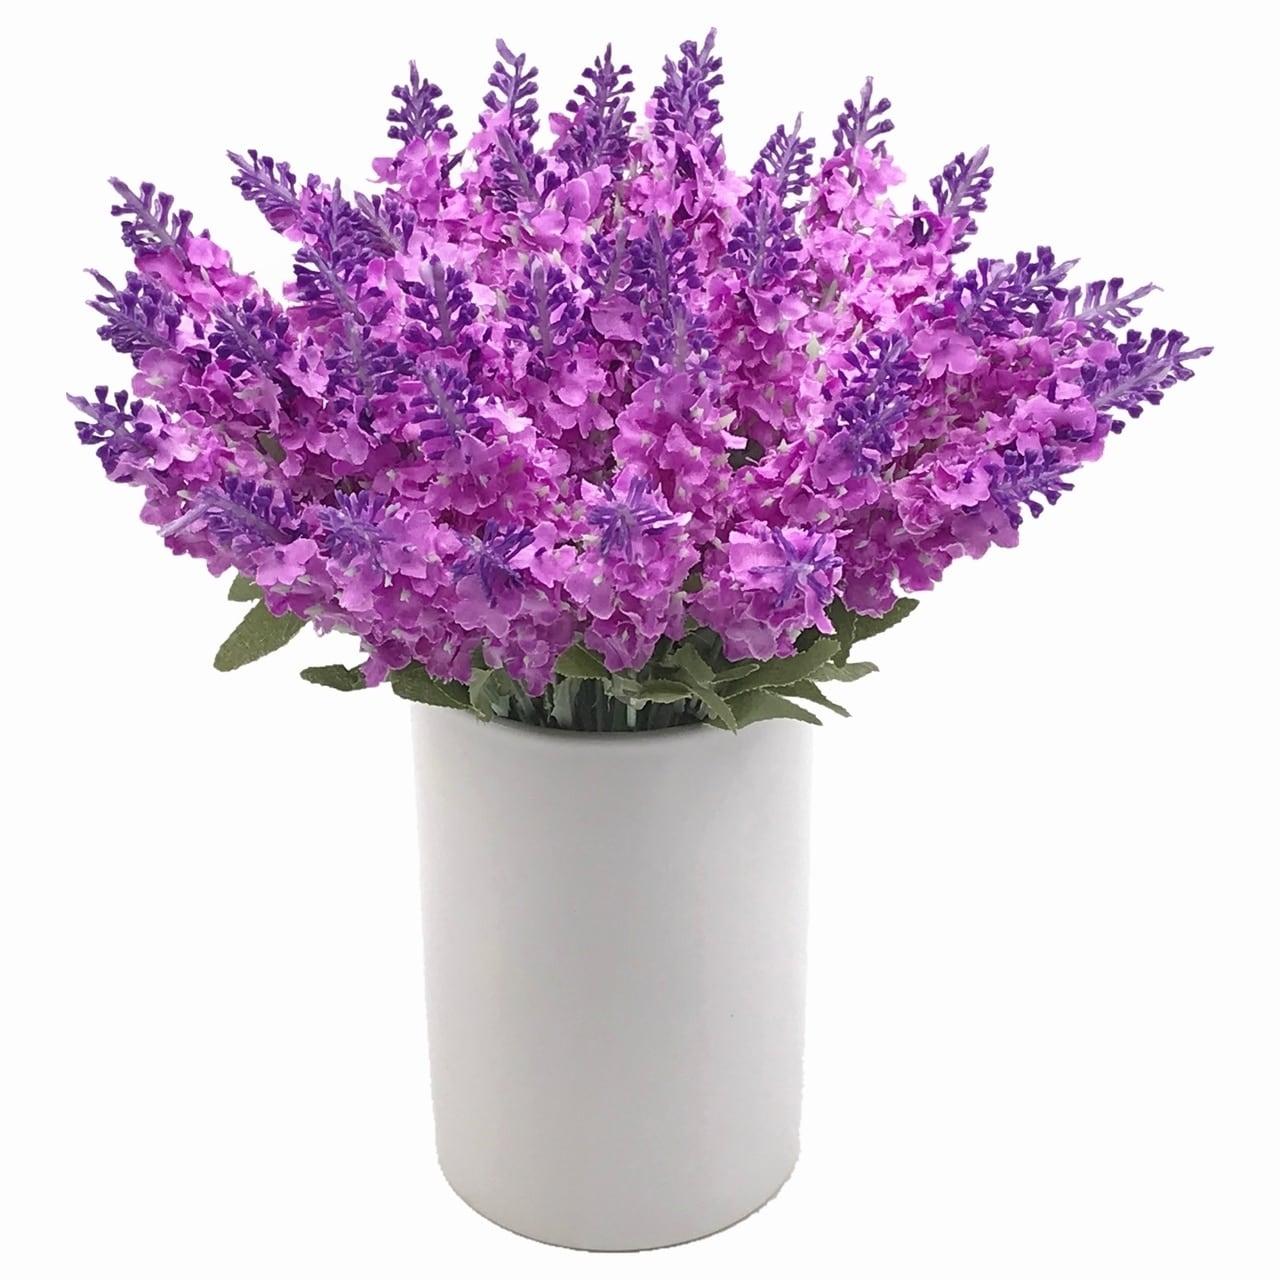 Enova Home 40 Heads Purple Lavender Arrangement In White Ceramic Vase Silk Flower Arrangement Centerpiece For Home Decoration Overstock 28087608